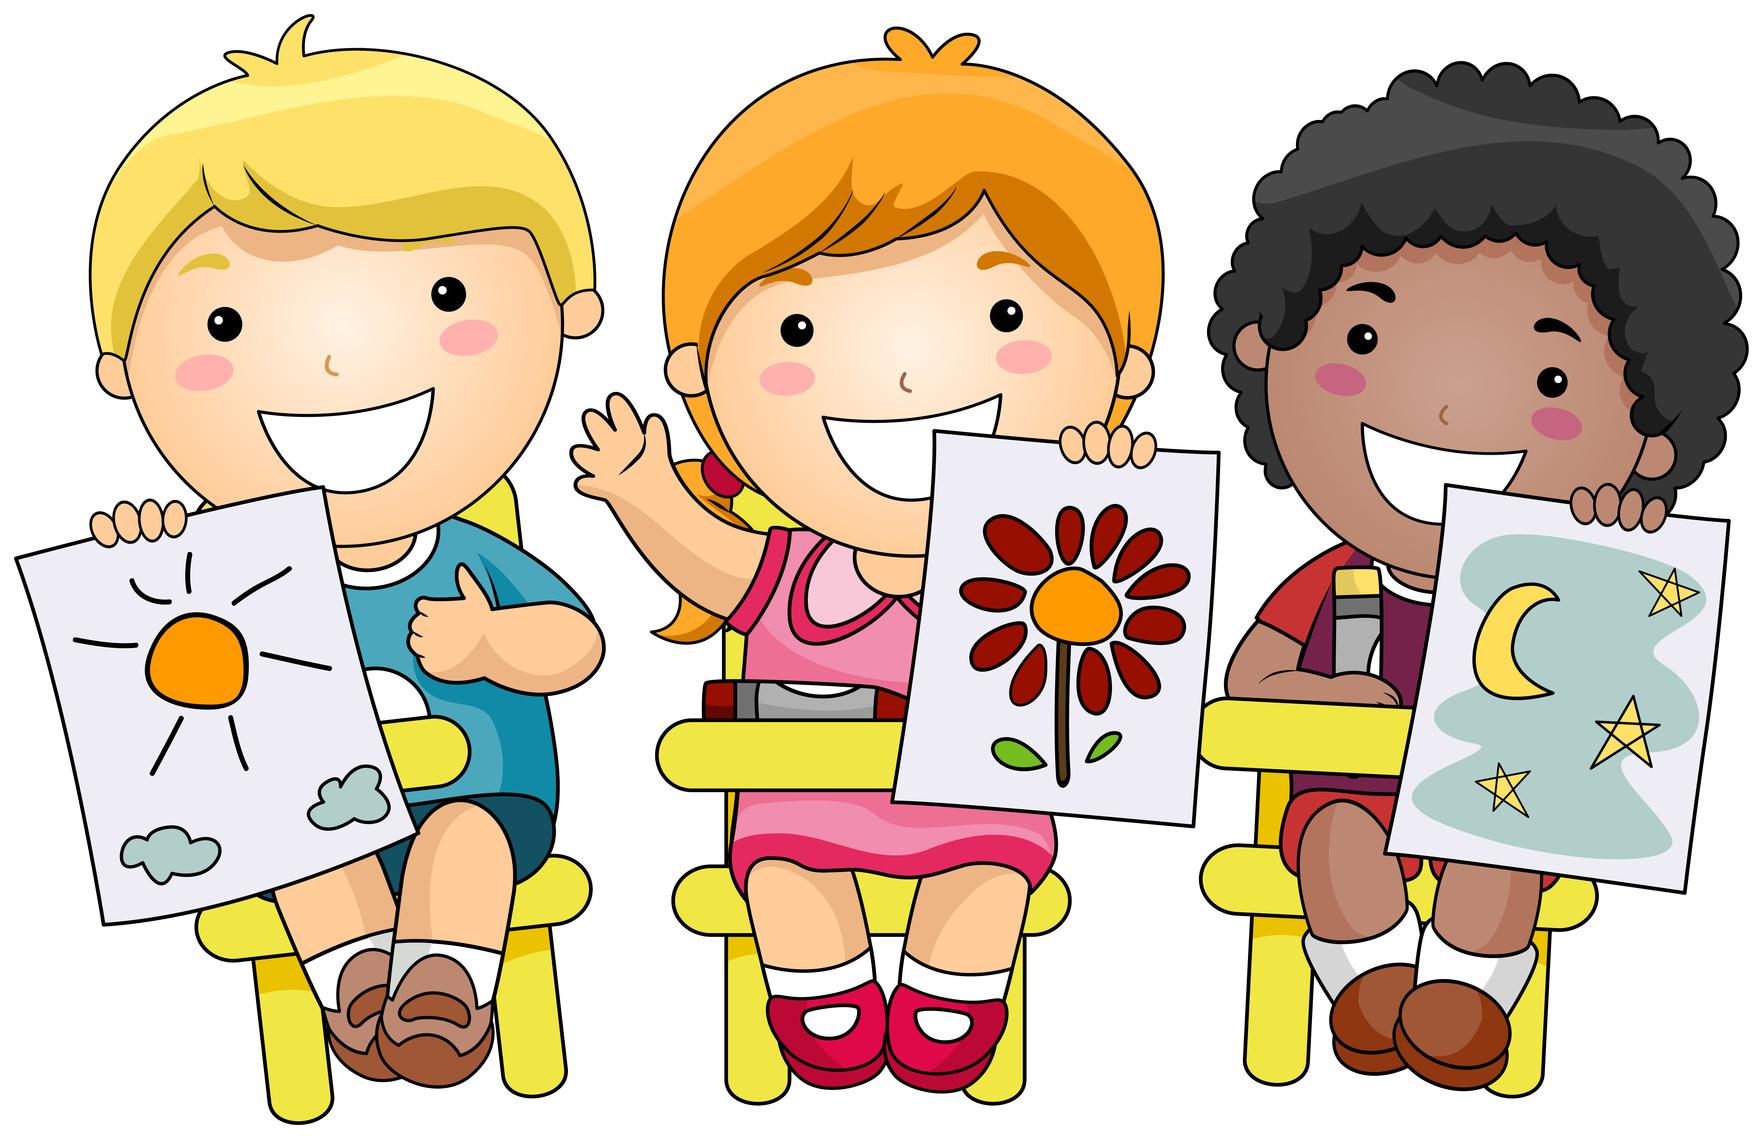 Clip Art Website For Kids-Clip art website for kids-6